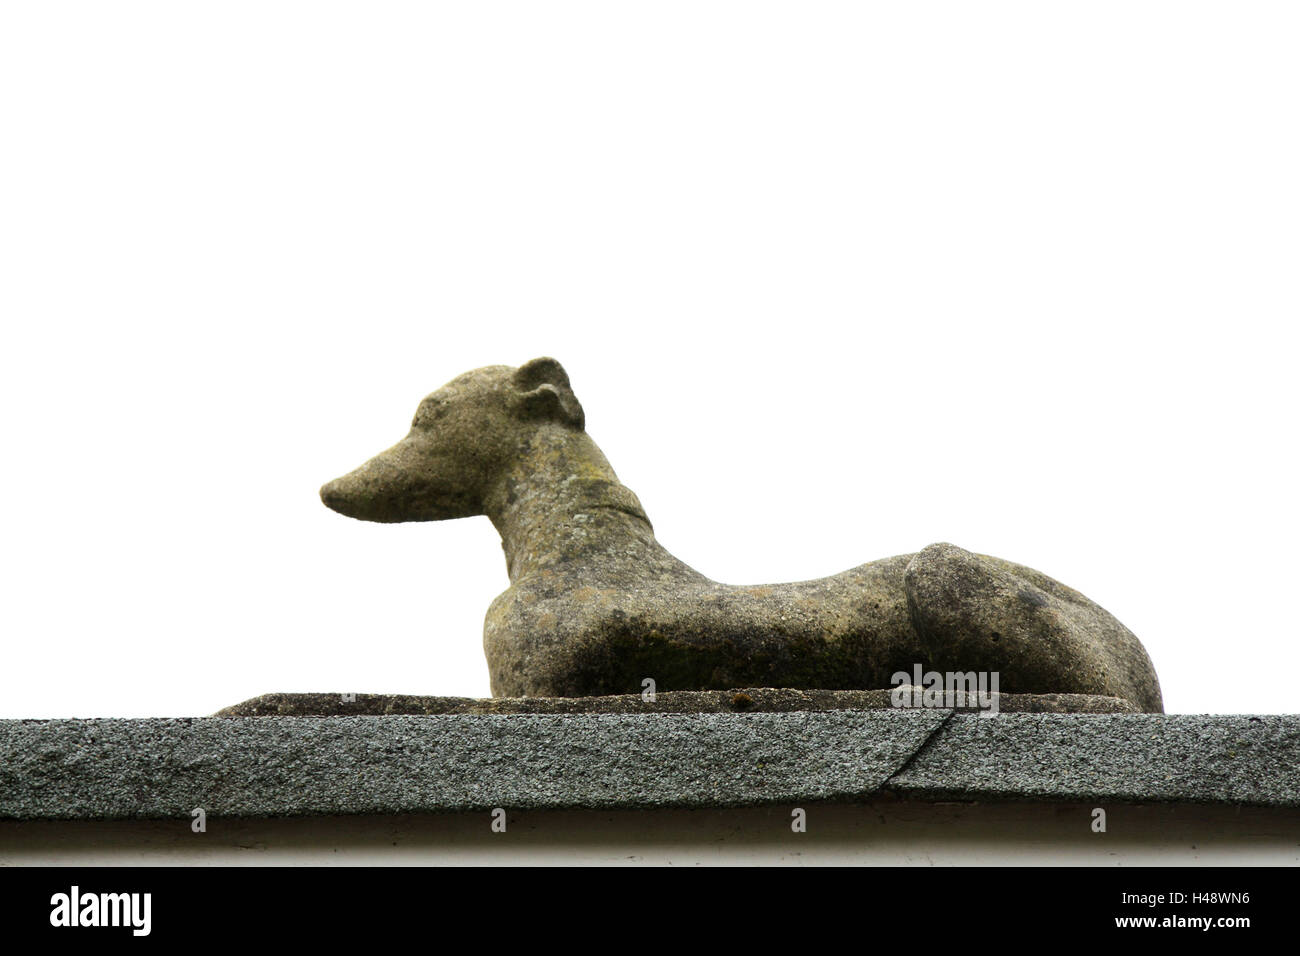 More poorly, stone figure, dog, lie, animal figure, stone dog, figure, adornment, decoration, product photography, - Stock Image